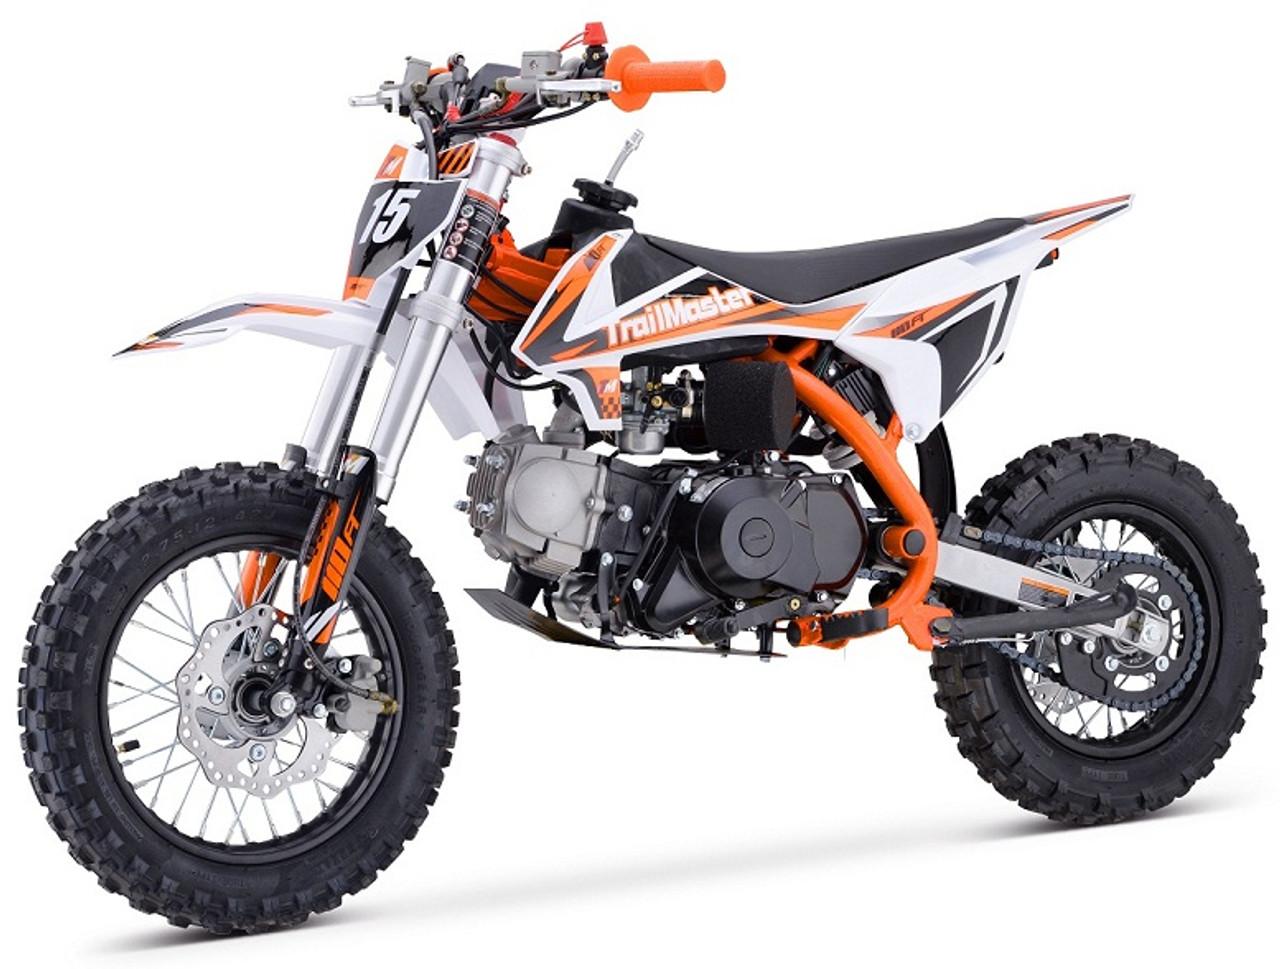 Trailmaster TM15 110cc Dirt Bike, Automatic Clutch Kick & Electric Start